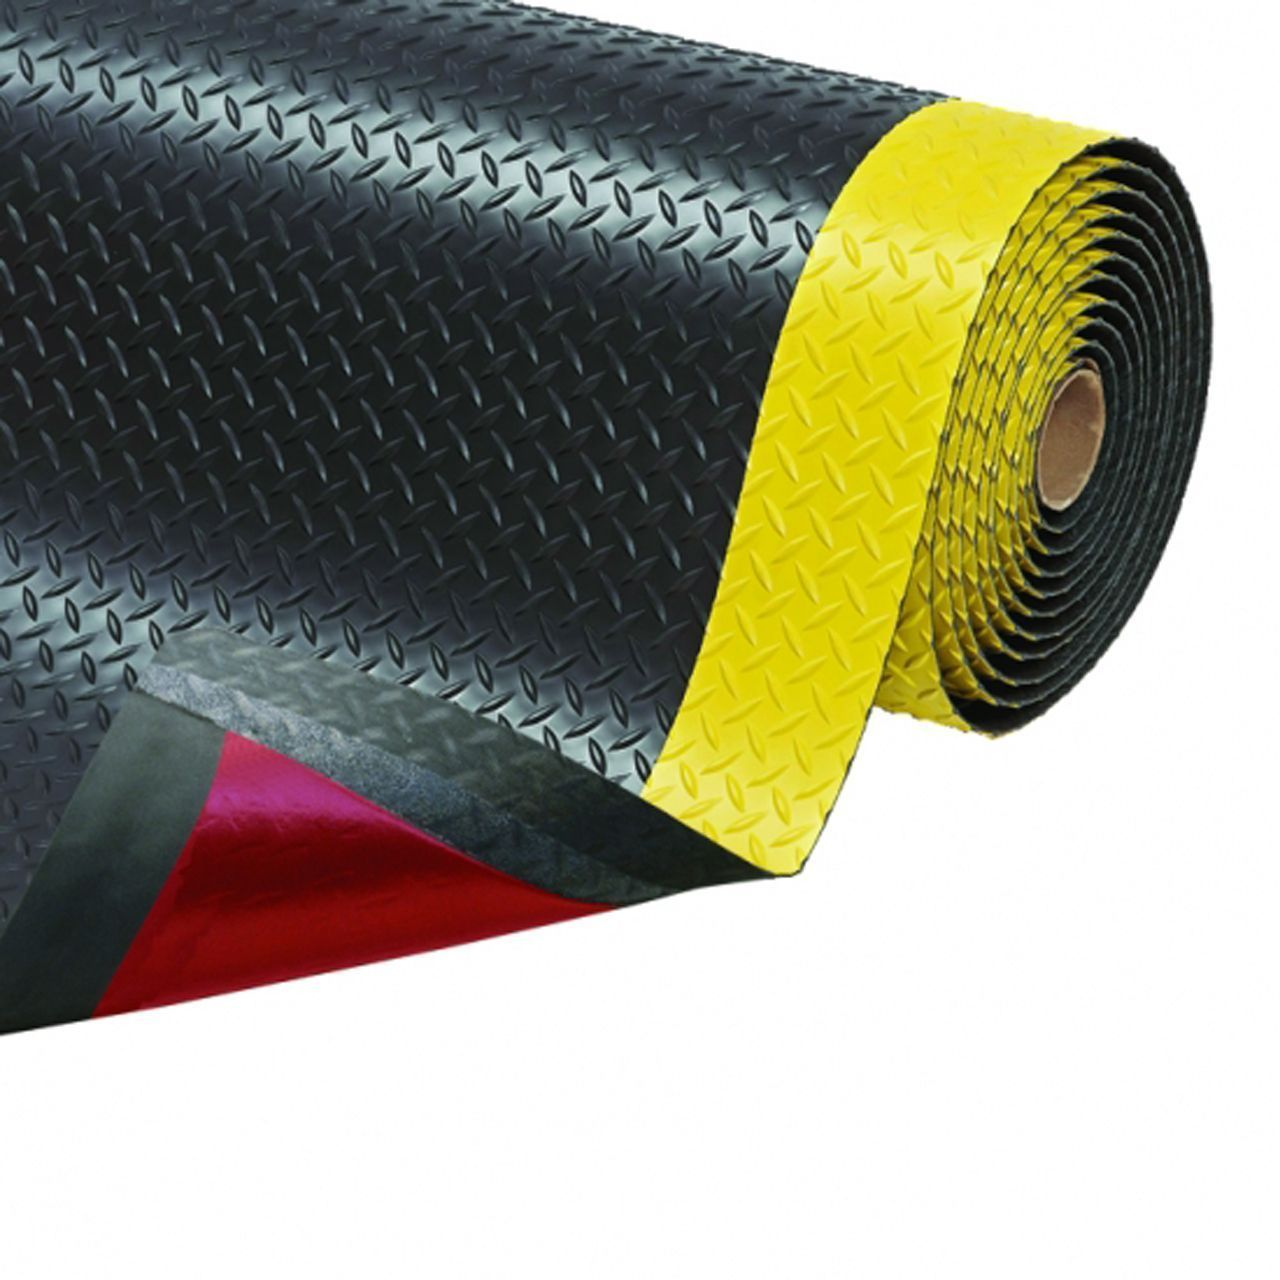 chushion trax anti vermoeidheidsmatten industriele hulpmiddelen 0001s Cushion Trax